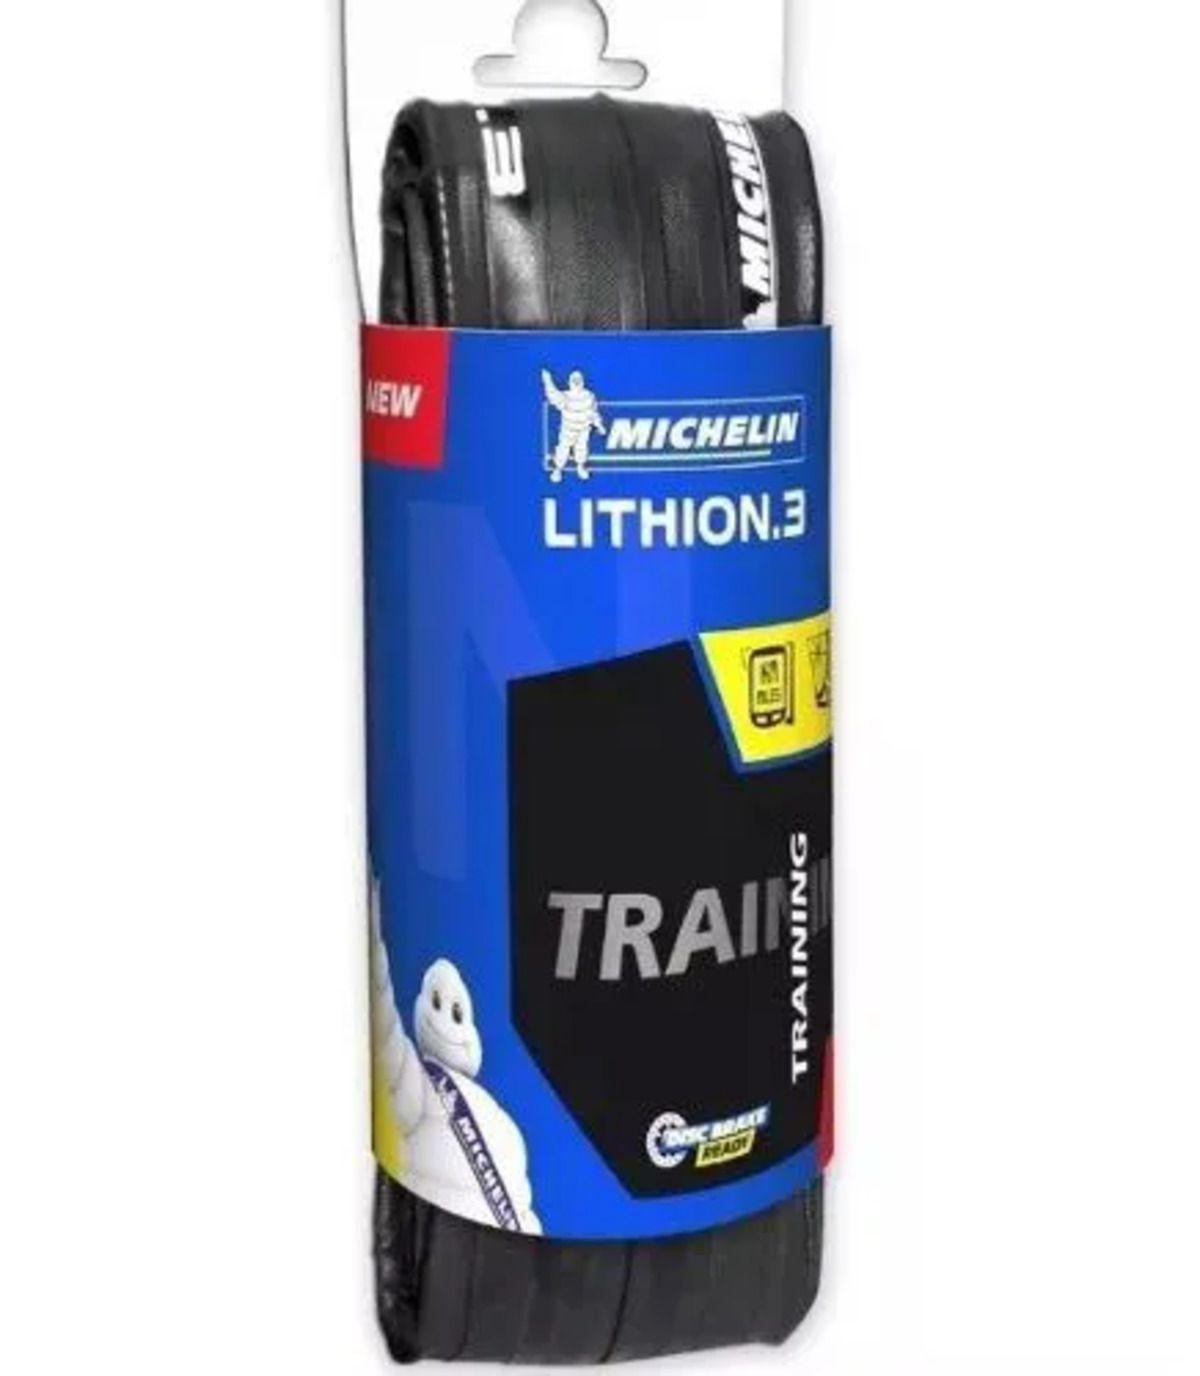 Kit Pneu Michelin Lithion 3 Kevlar 700x23 com Câmara Pirelli 700